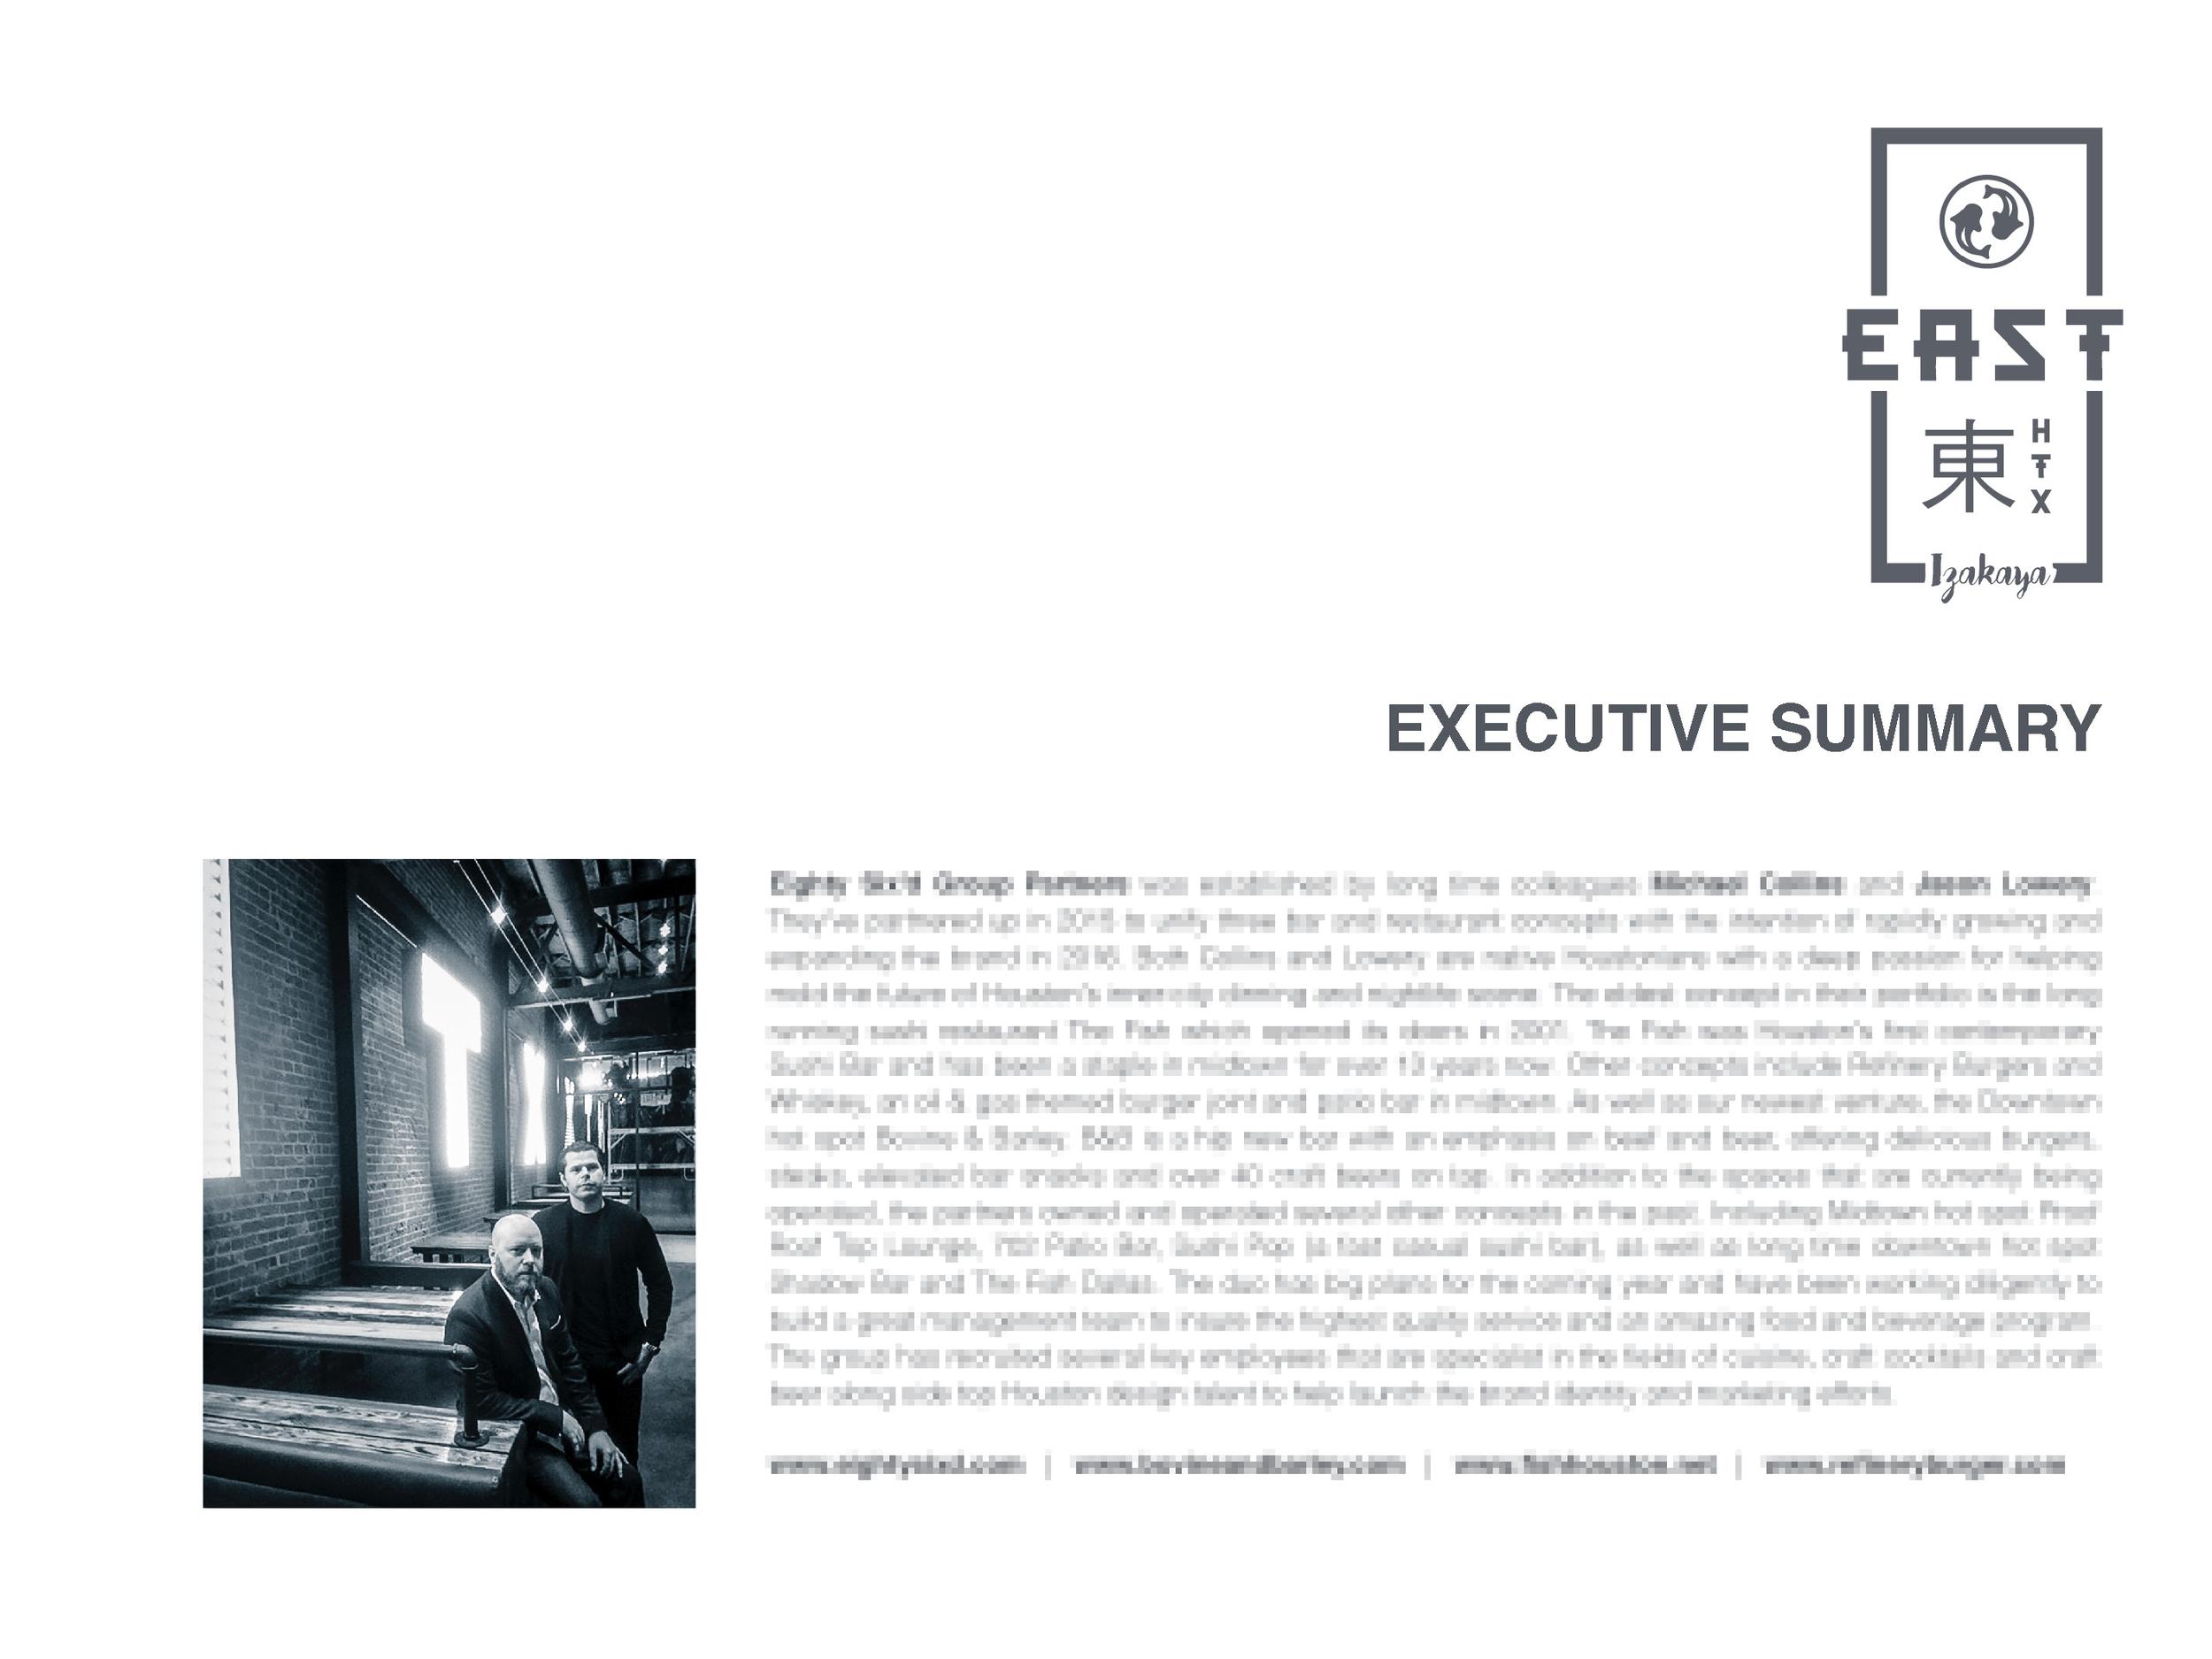 EastHTX-VenueProposal-DEC2015_Page_02.jpg